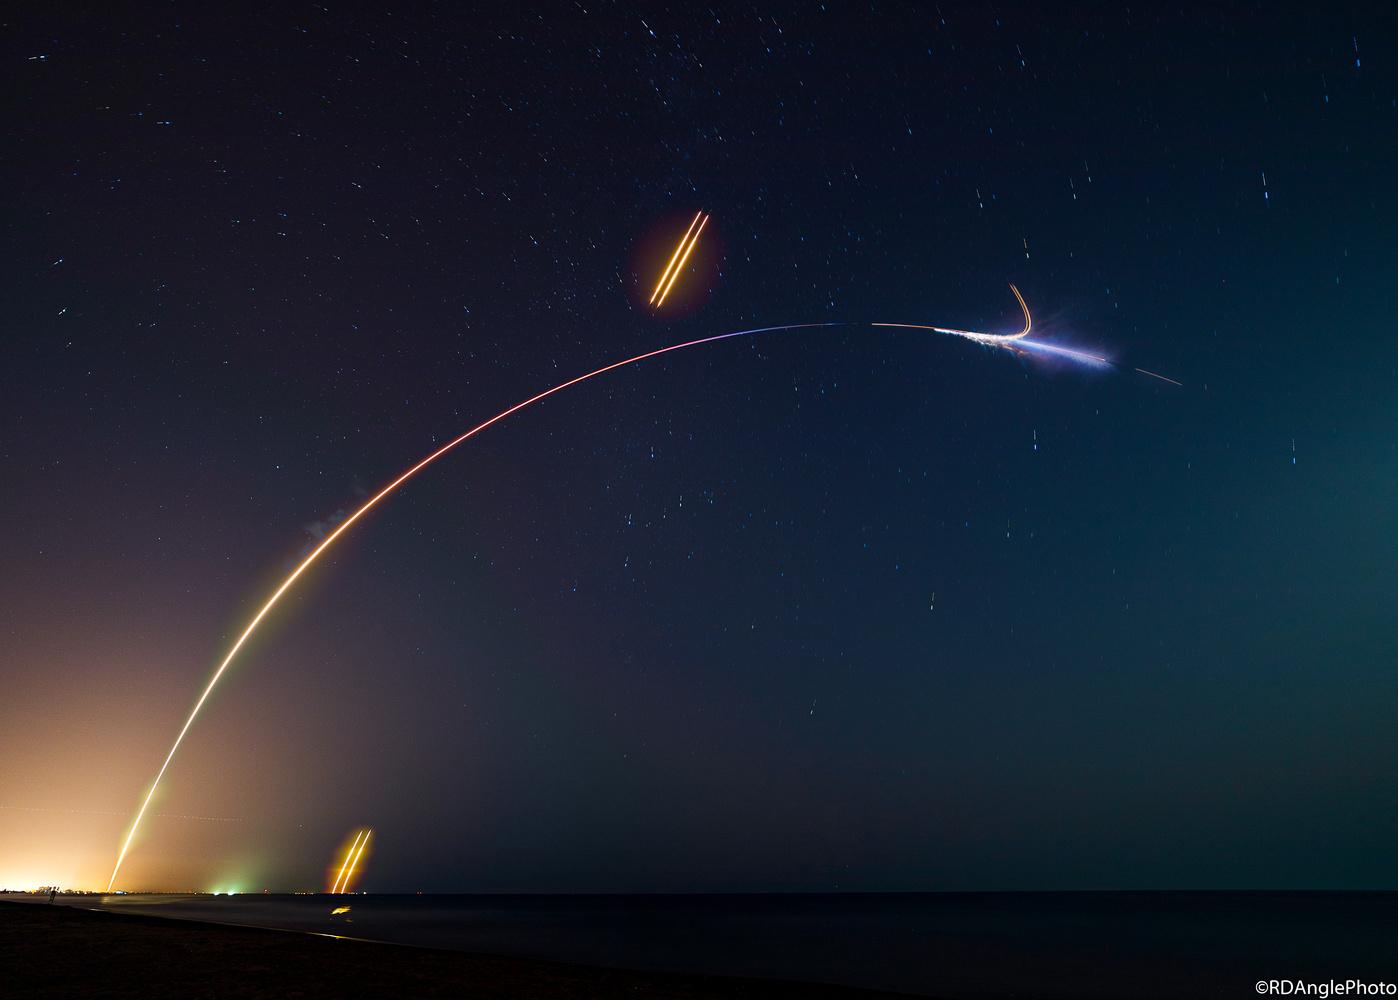 Falcon Heavy Streaks Through the Night! by Richard Angle